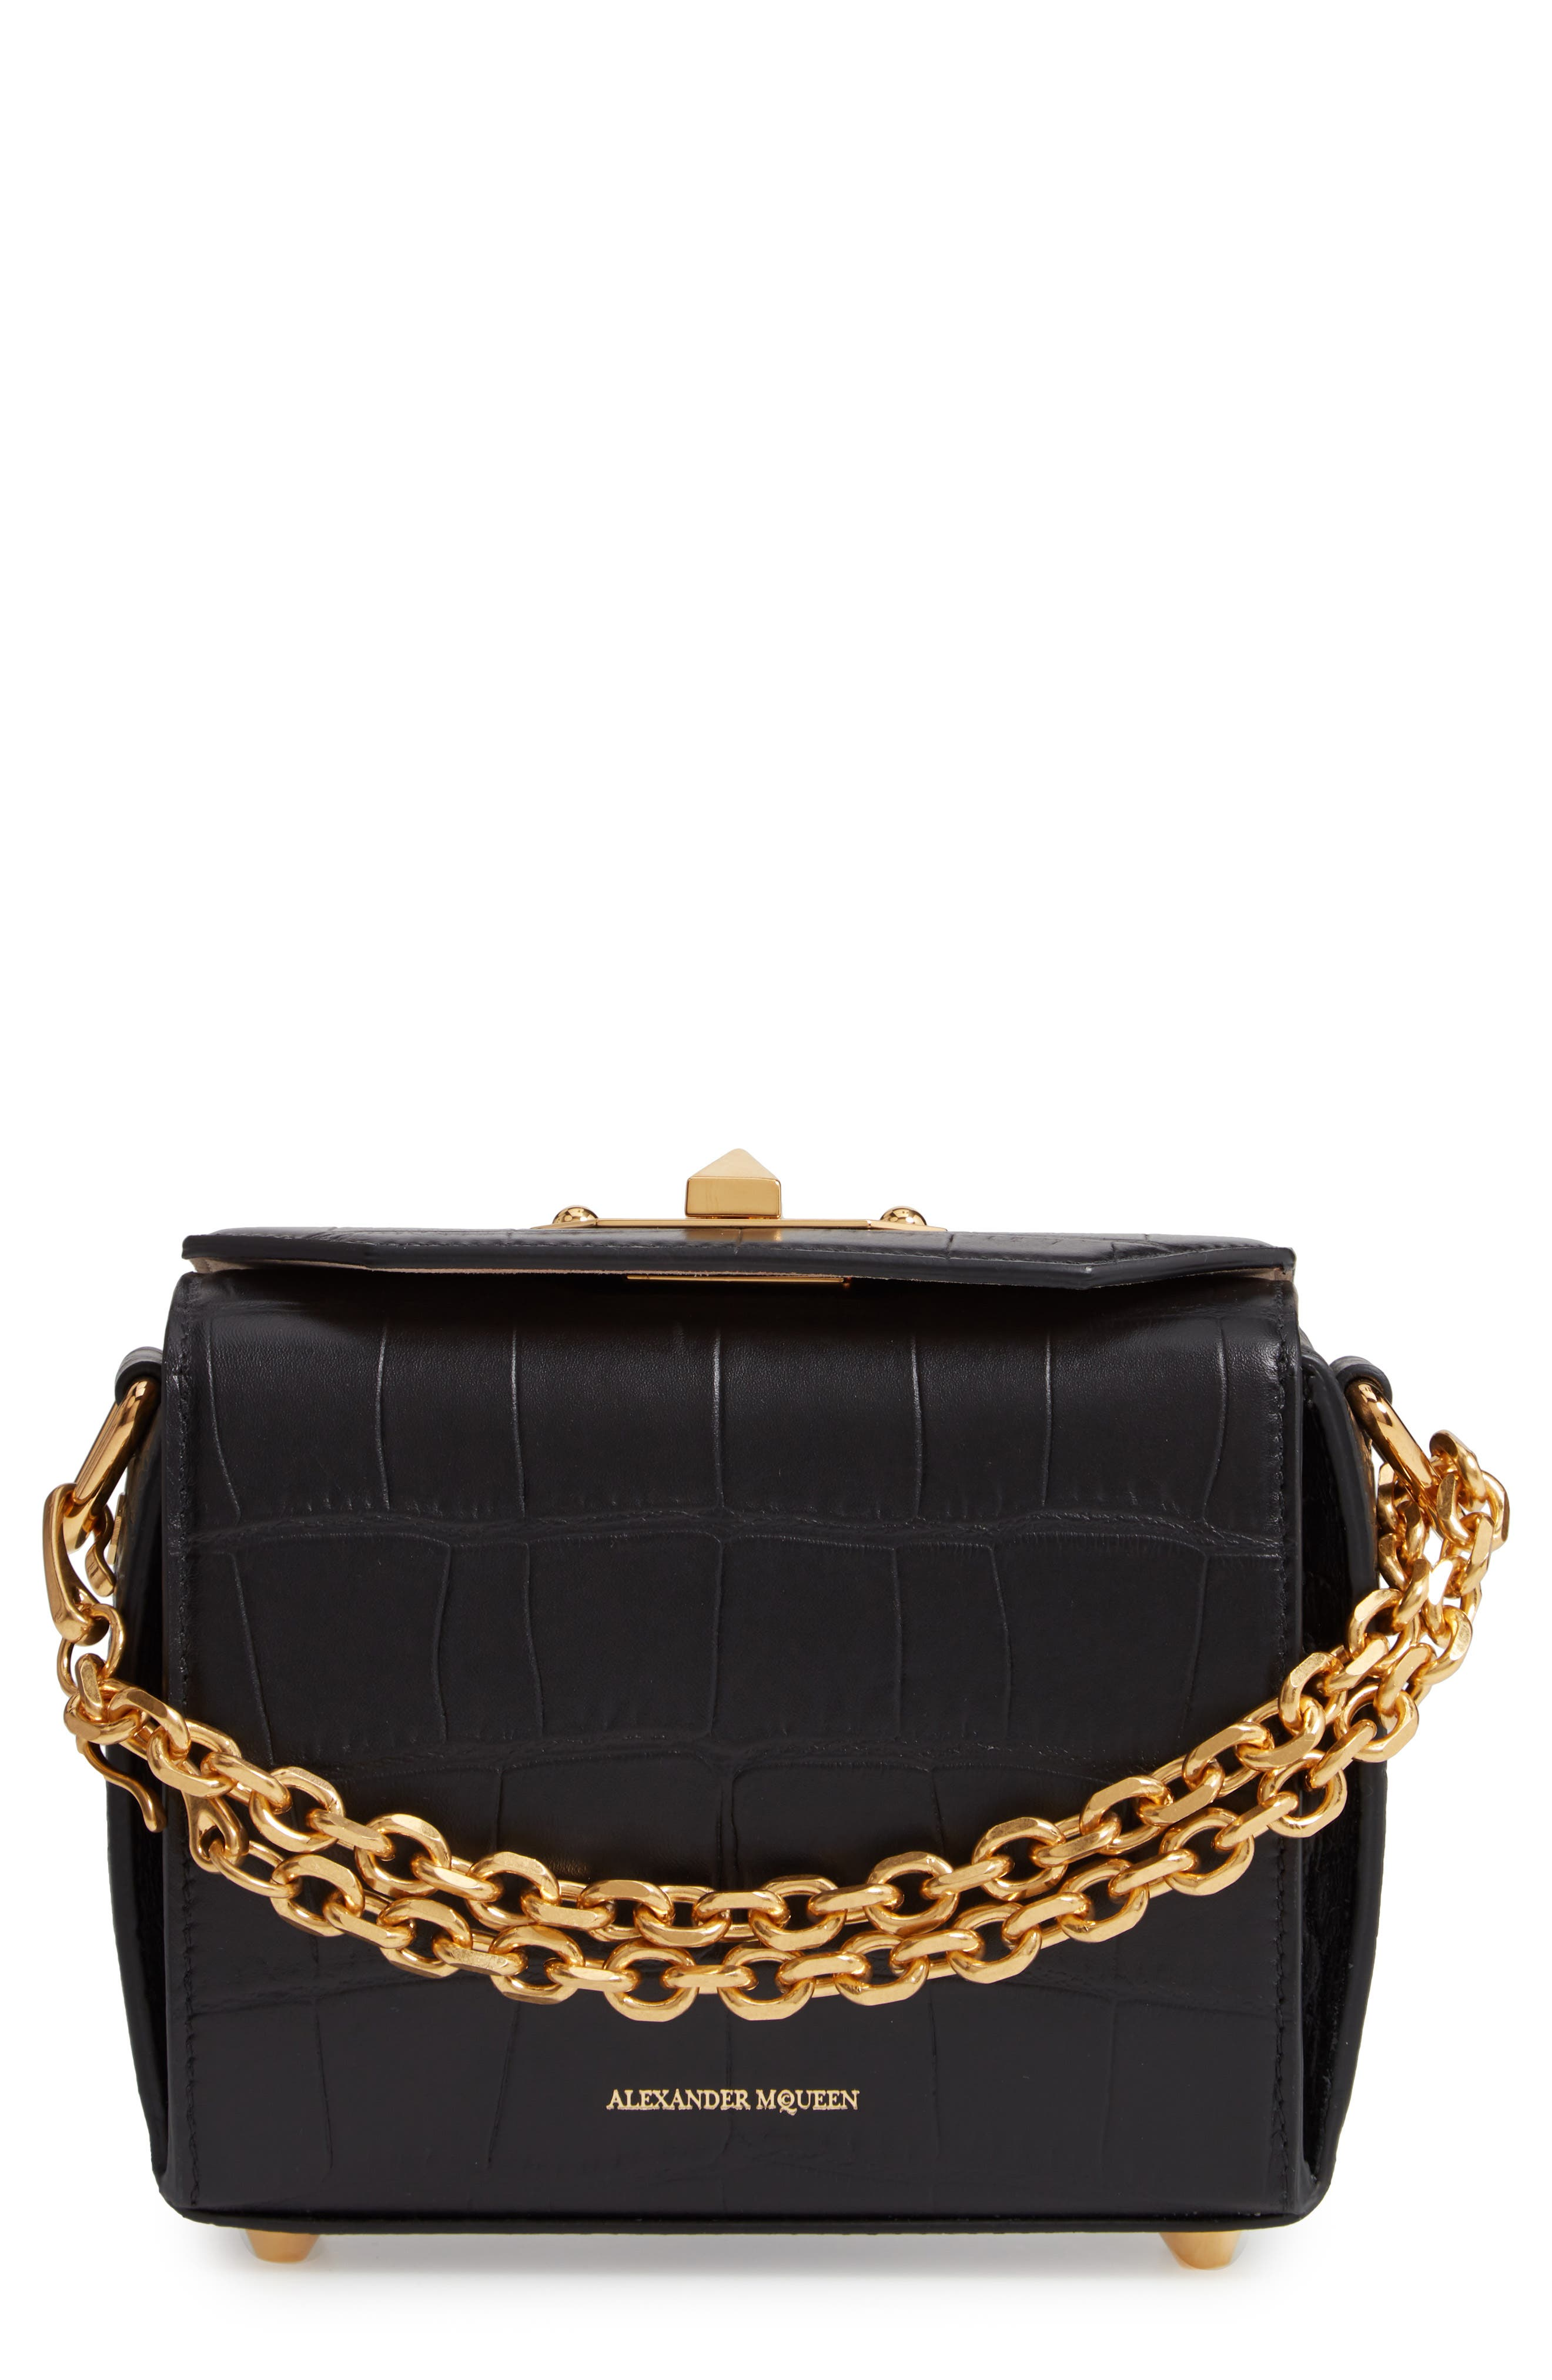 ALEXANDER MCQUEEN Mini Box Croc-Embossed Leather Bag, Main, color, 001